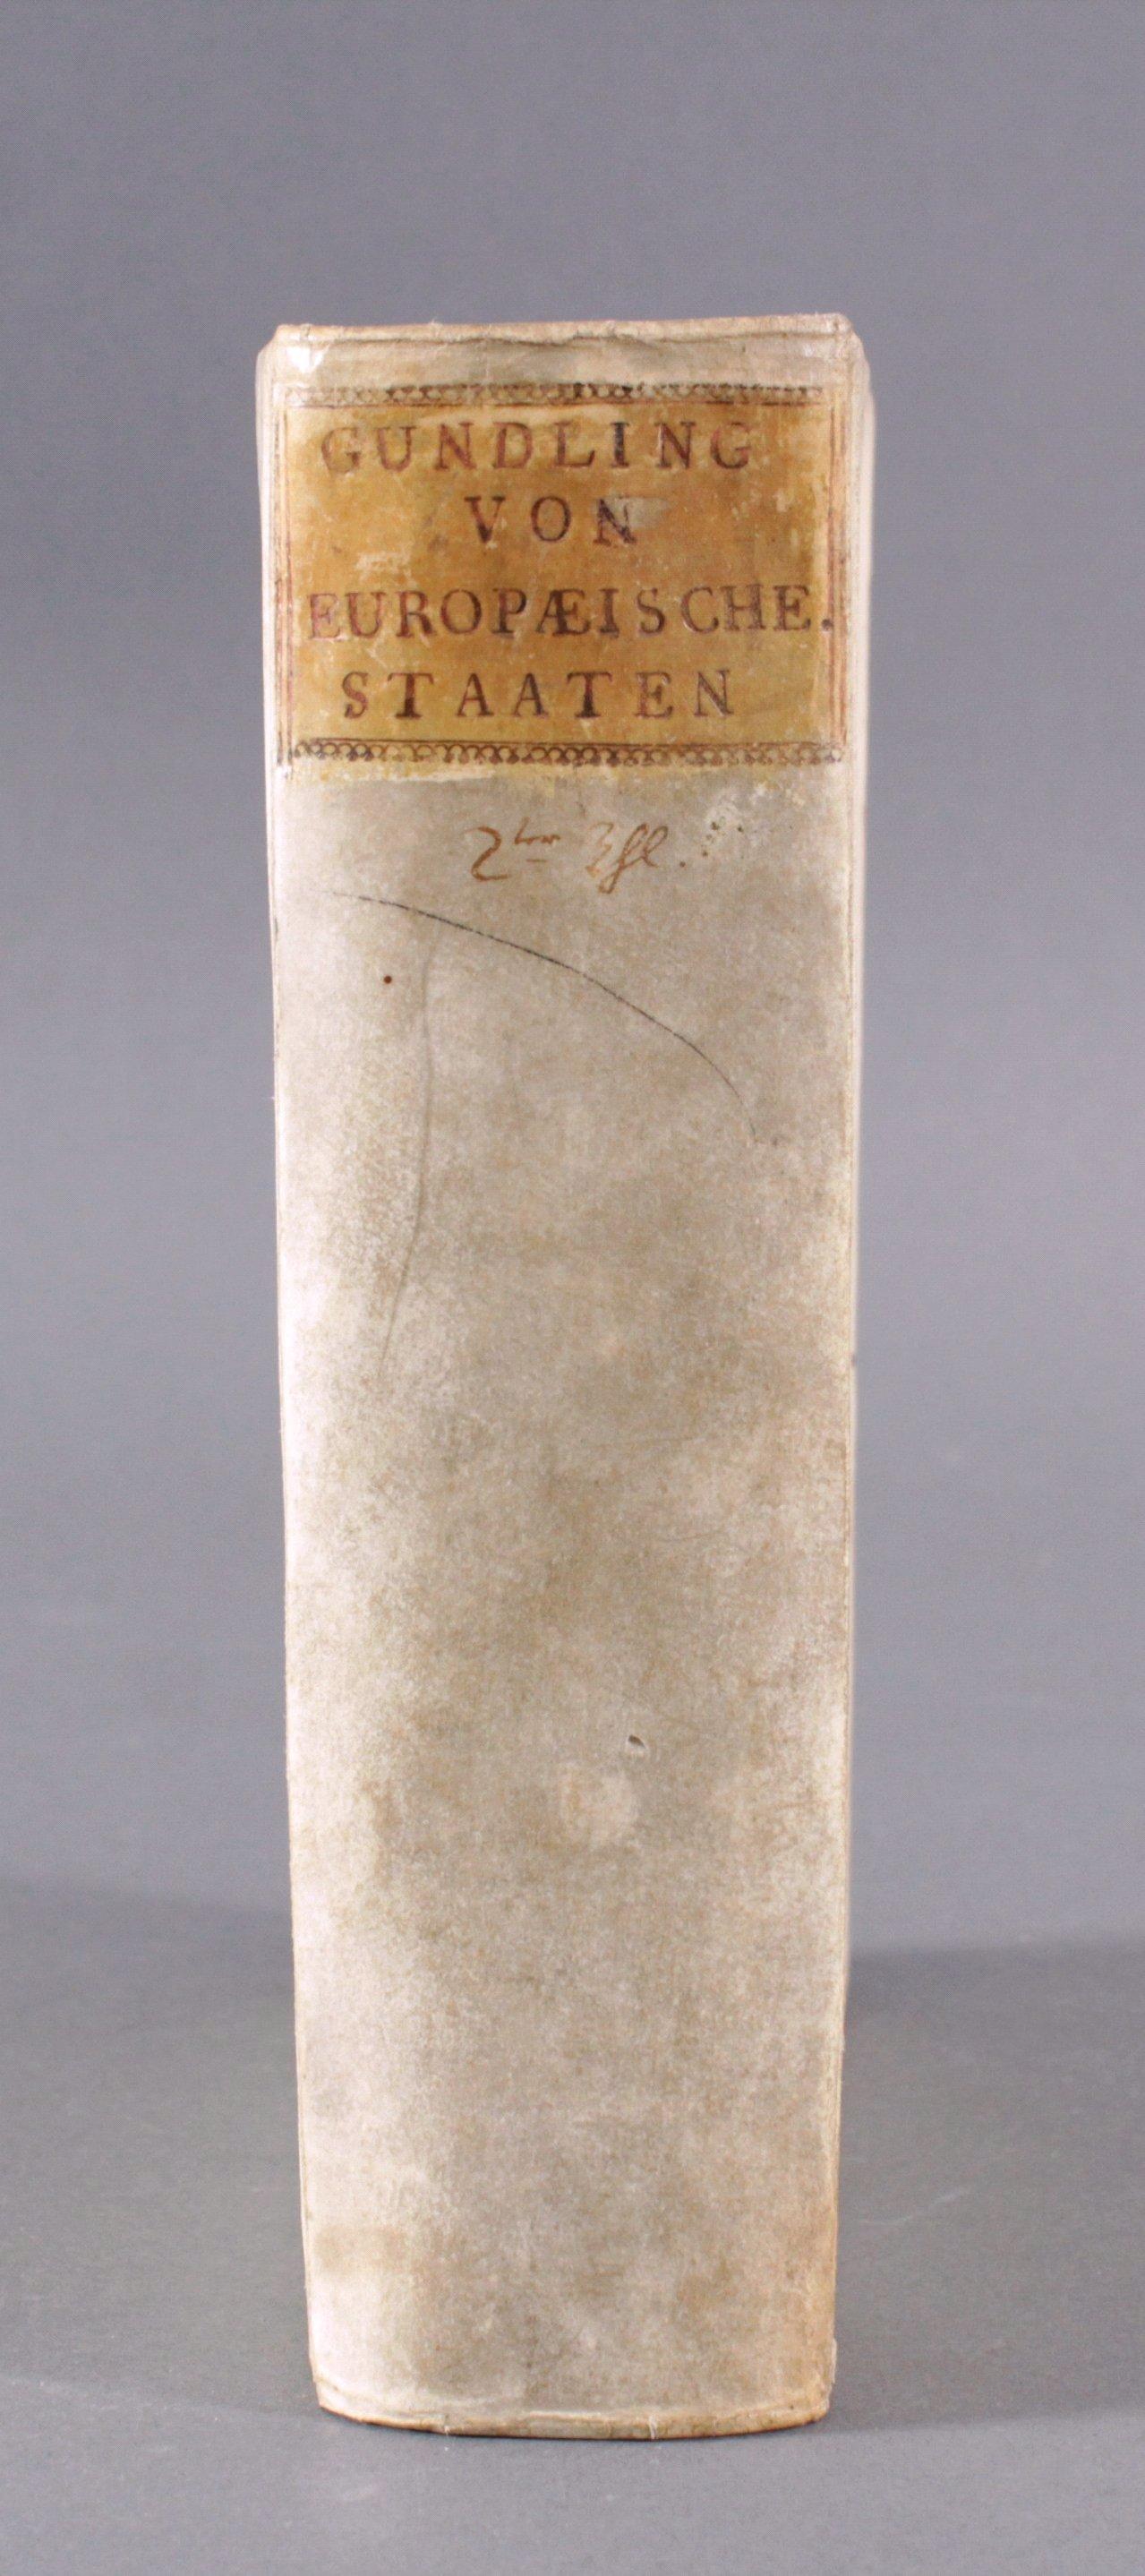 D. Nic. Hier Gundlings Discours, 1734-1